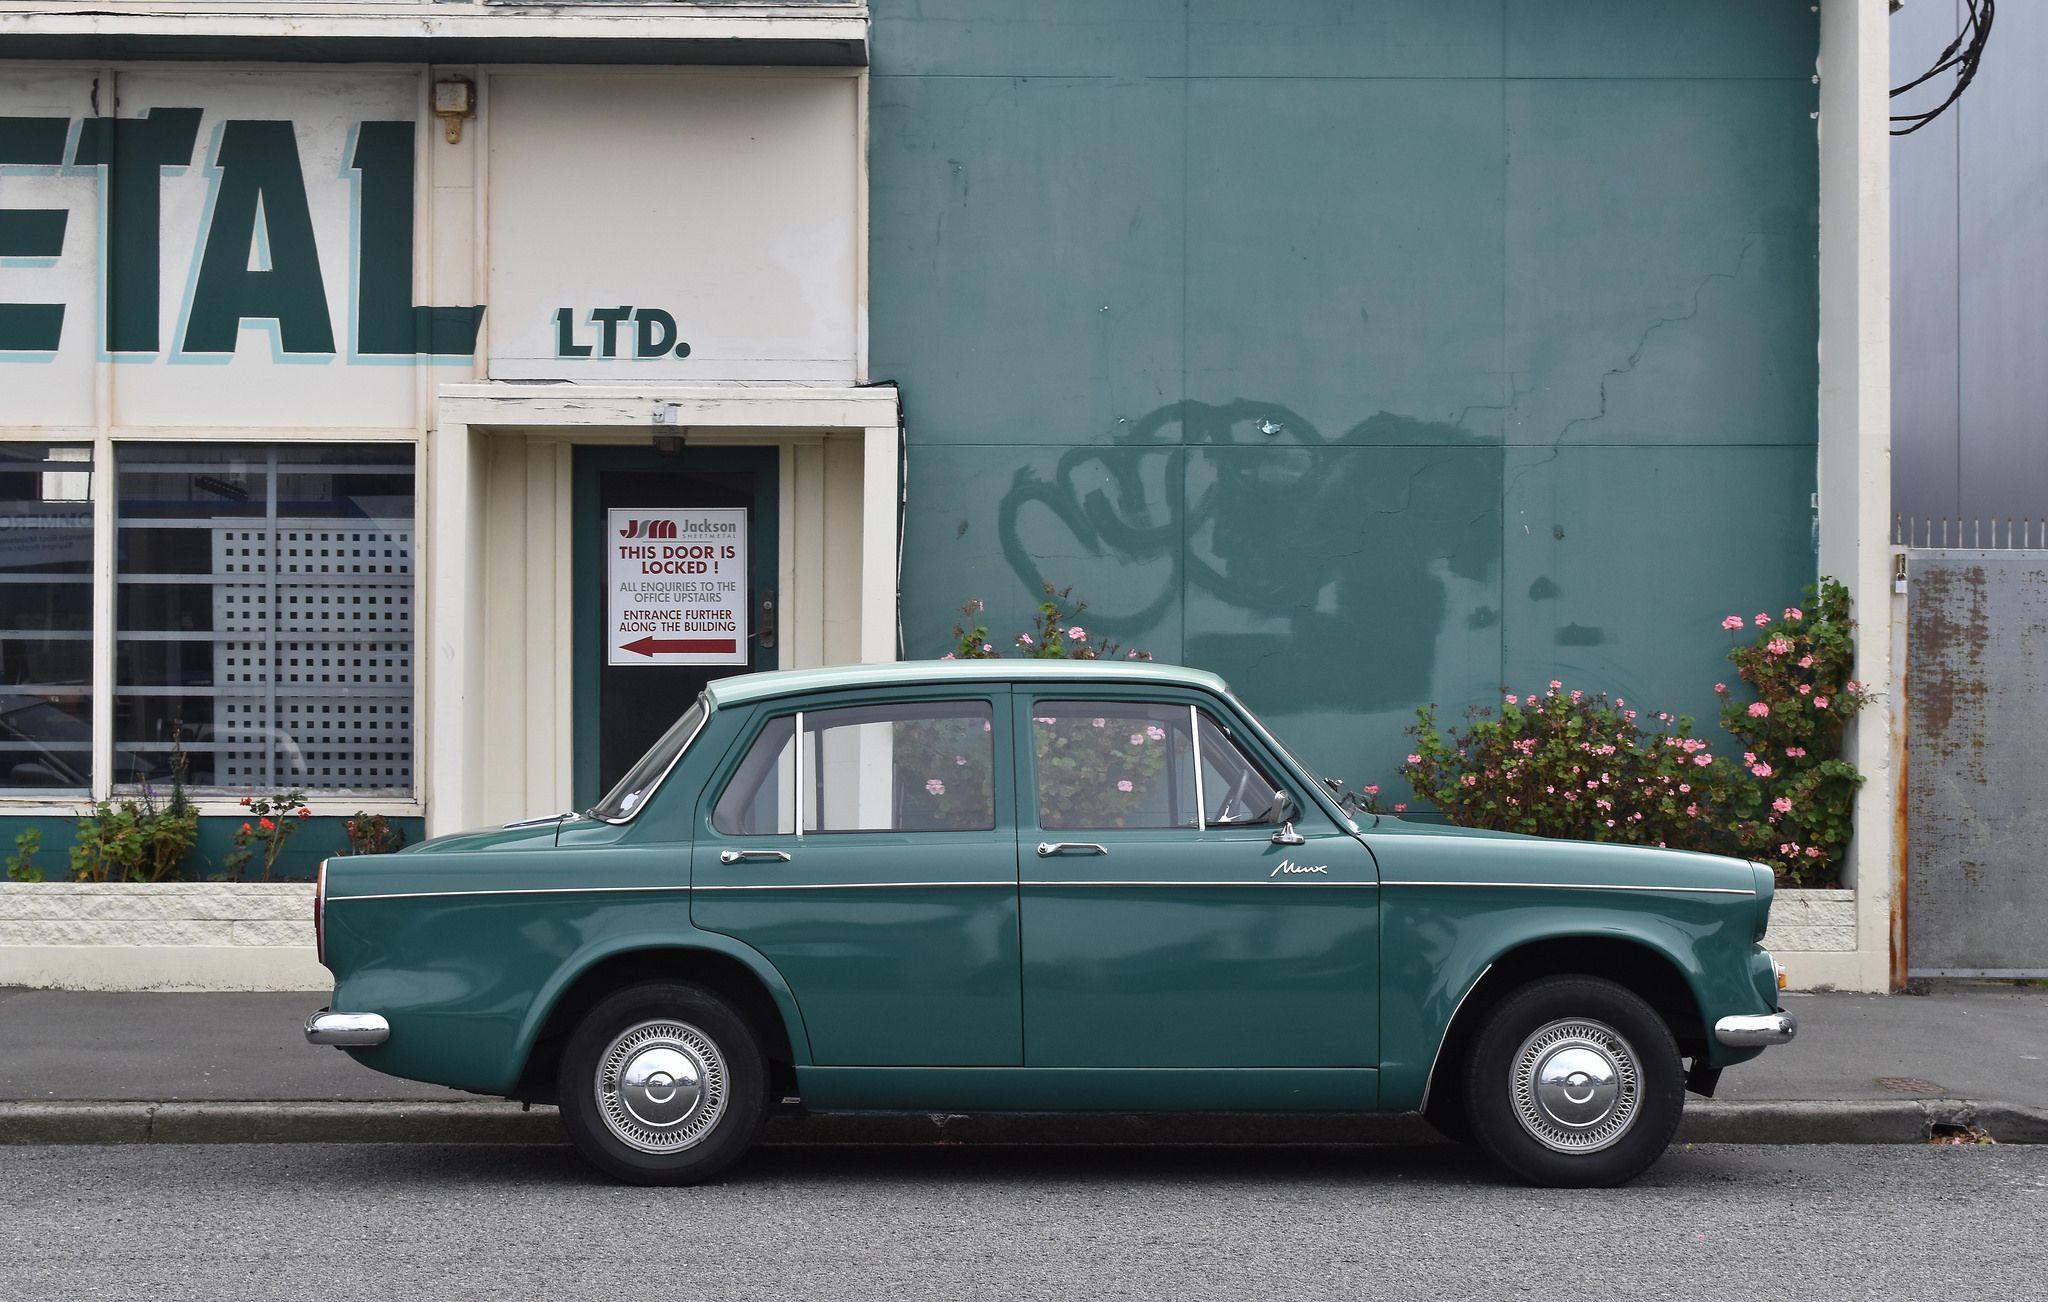 1964 Hillman Minx New zealand, Cars, British